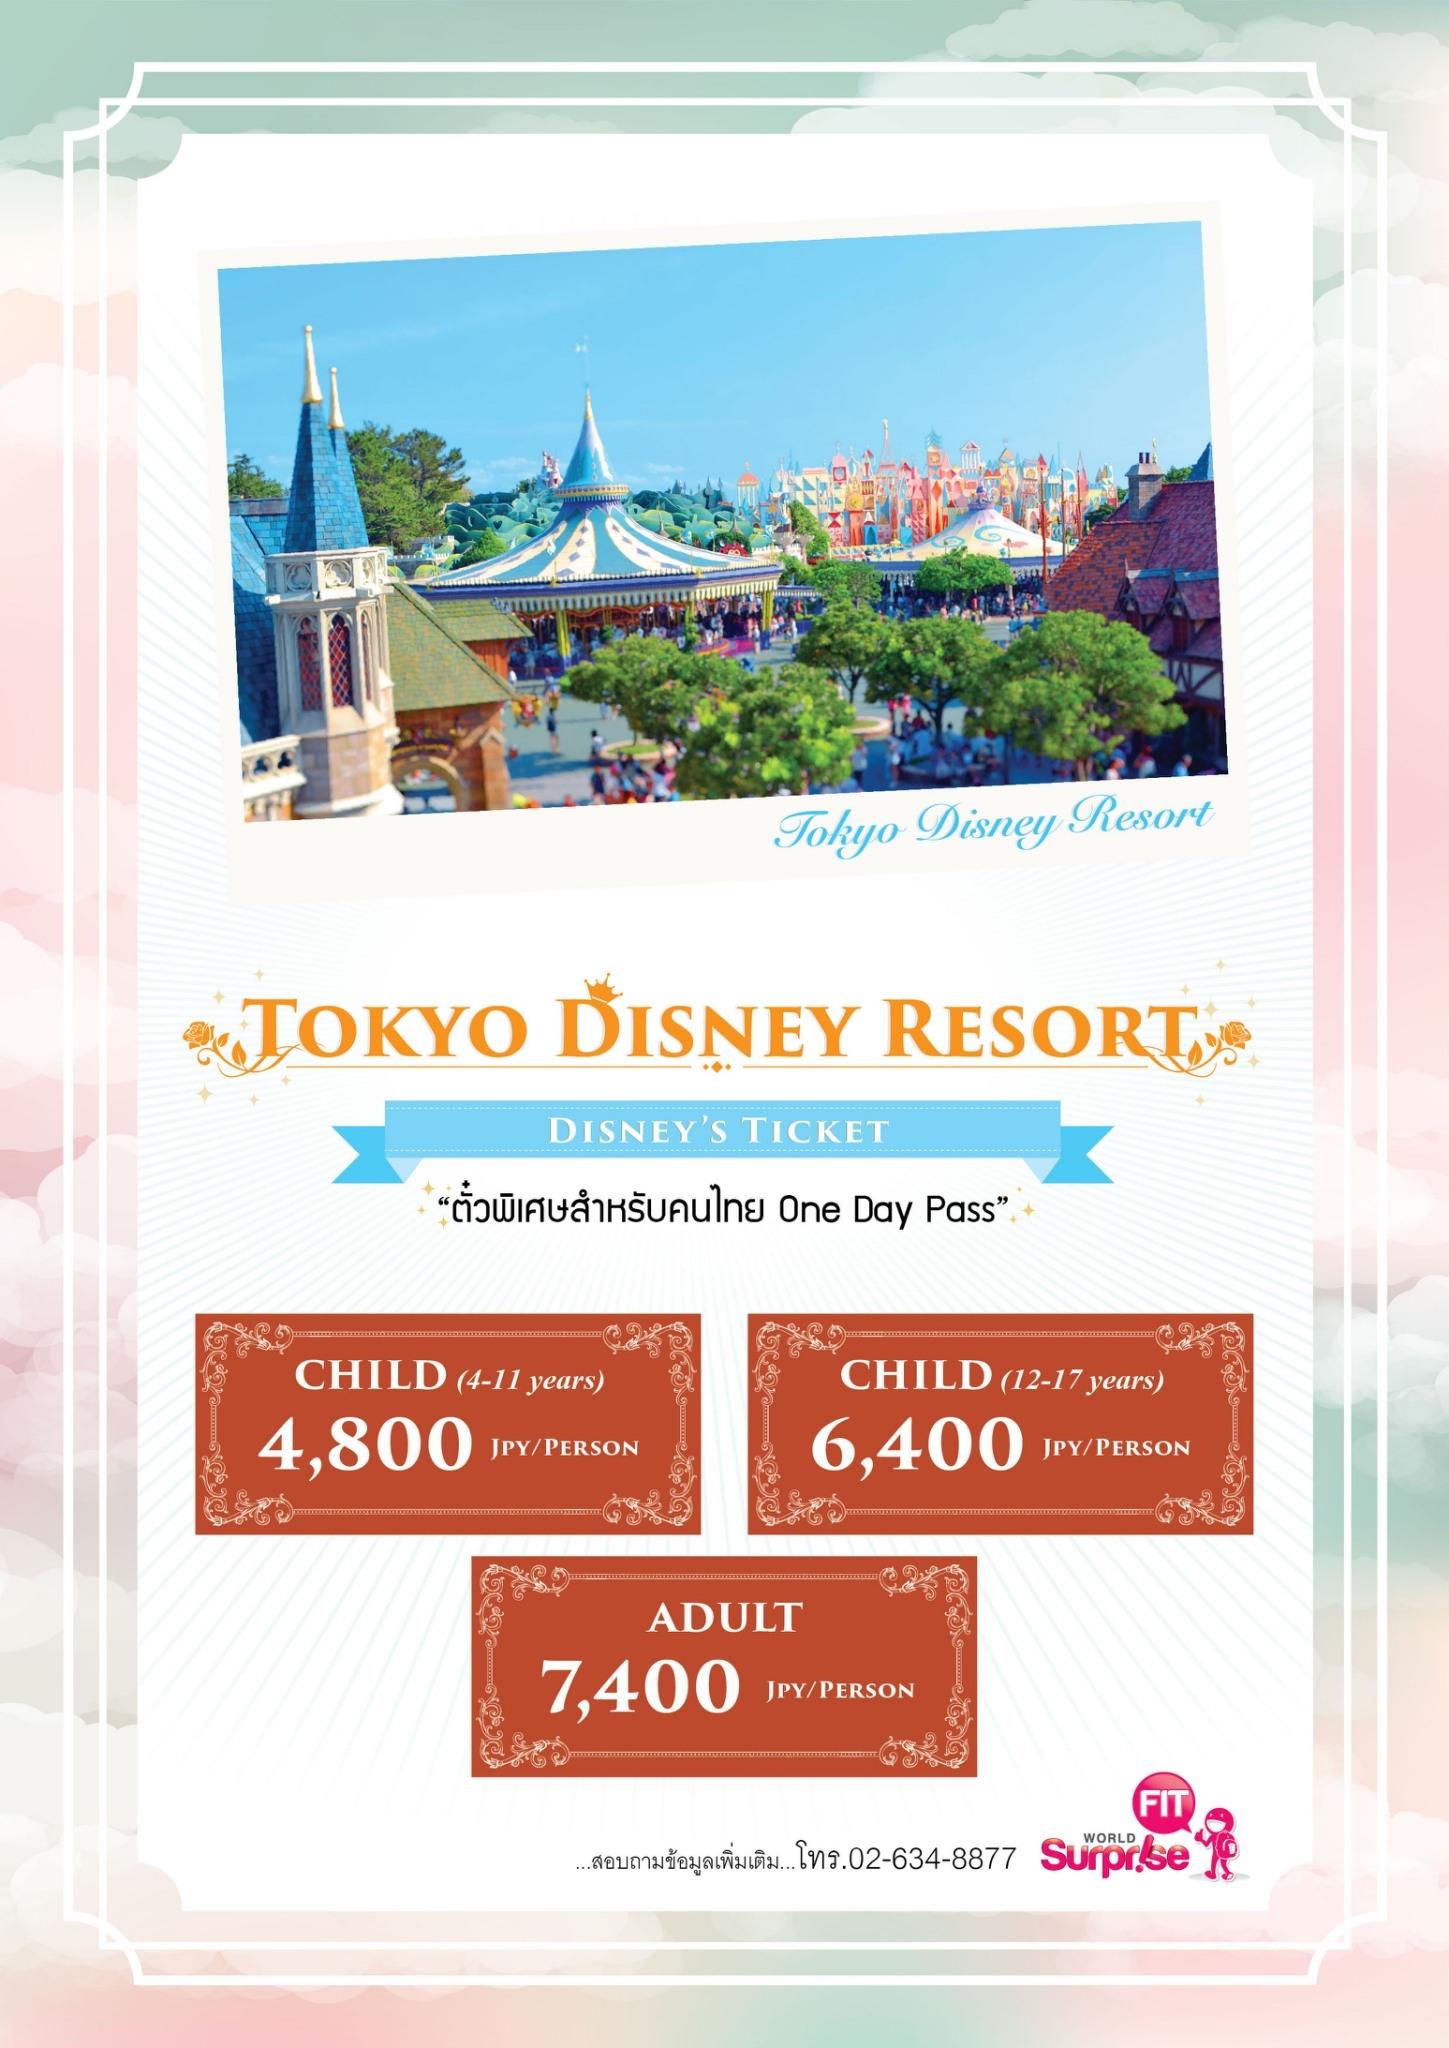 Kansai + Disney_8694